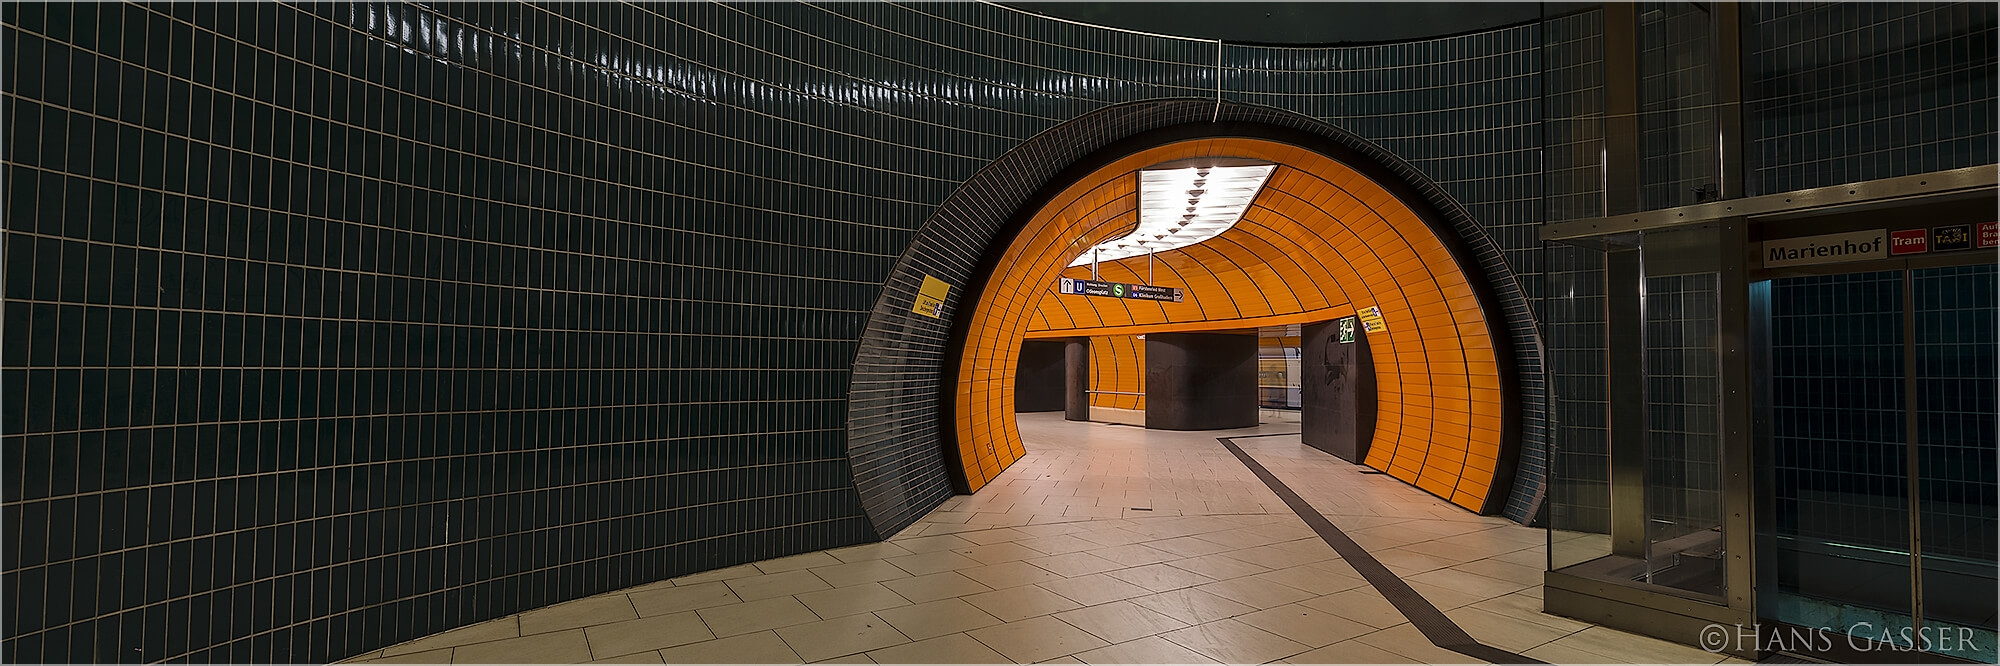 Panoramabild U-Bahn Sation Marienplatz München